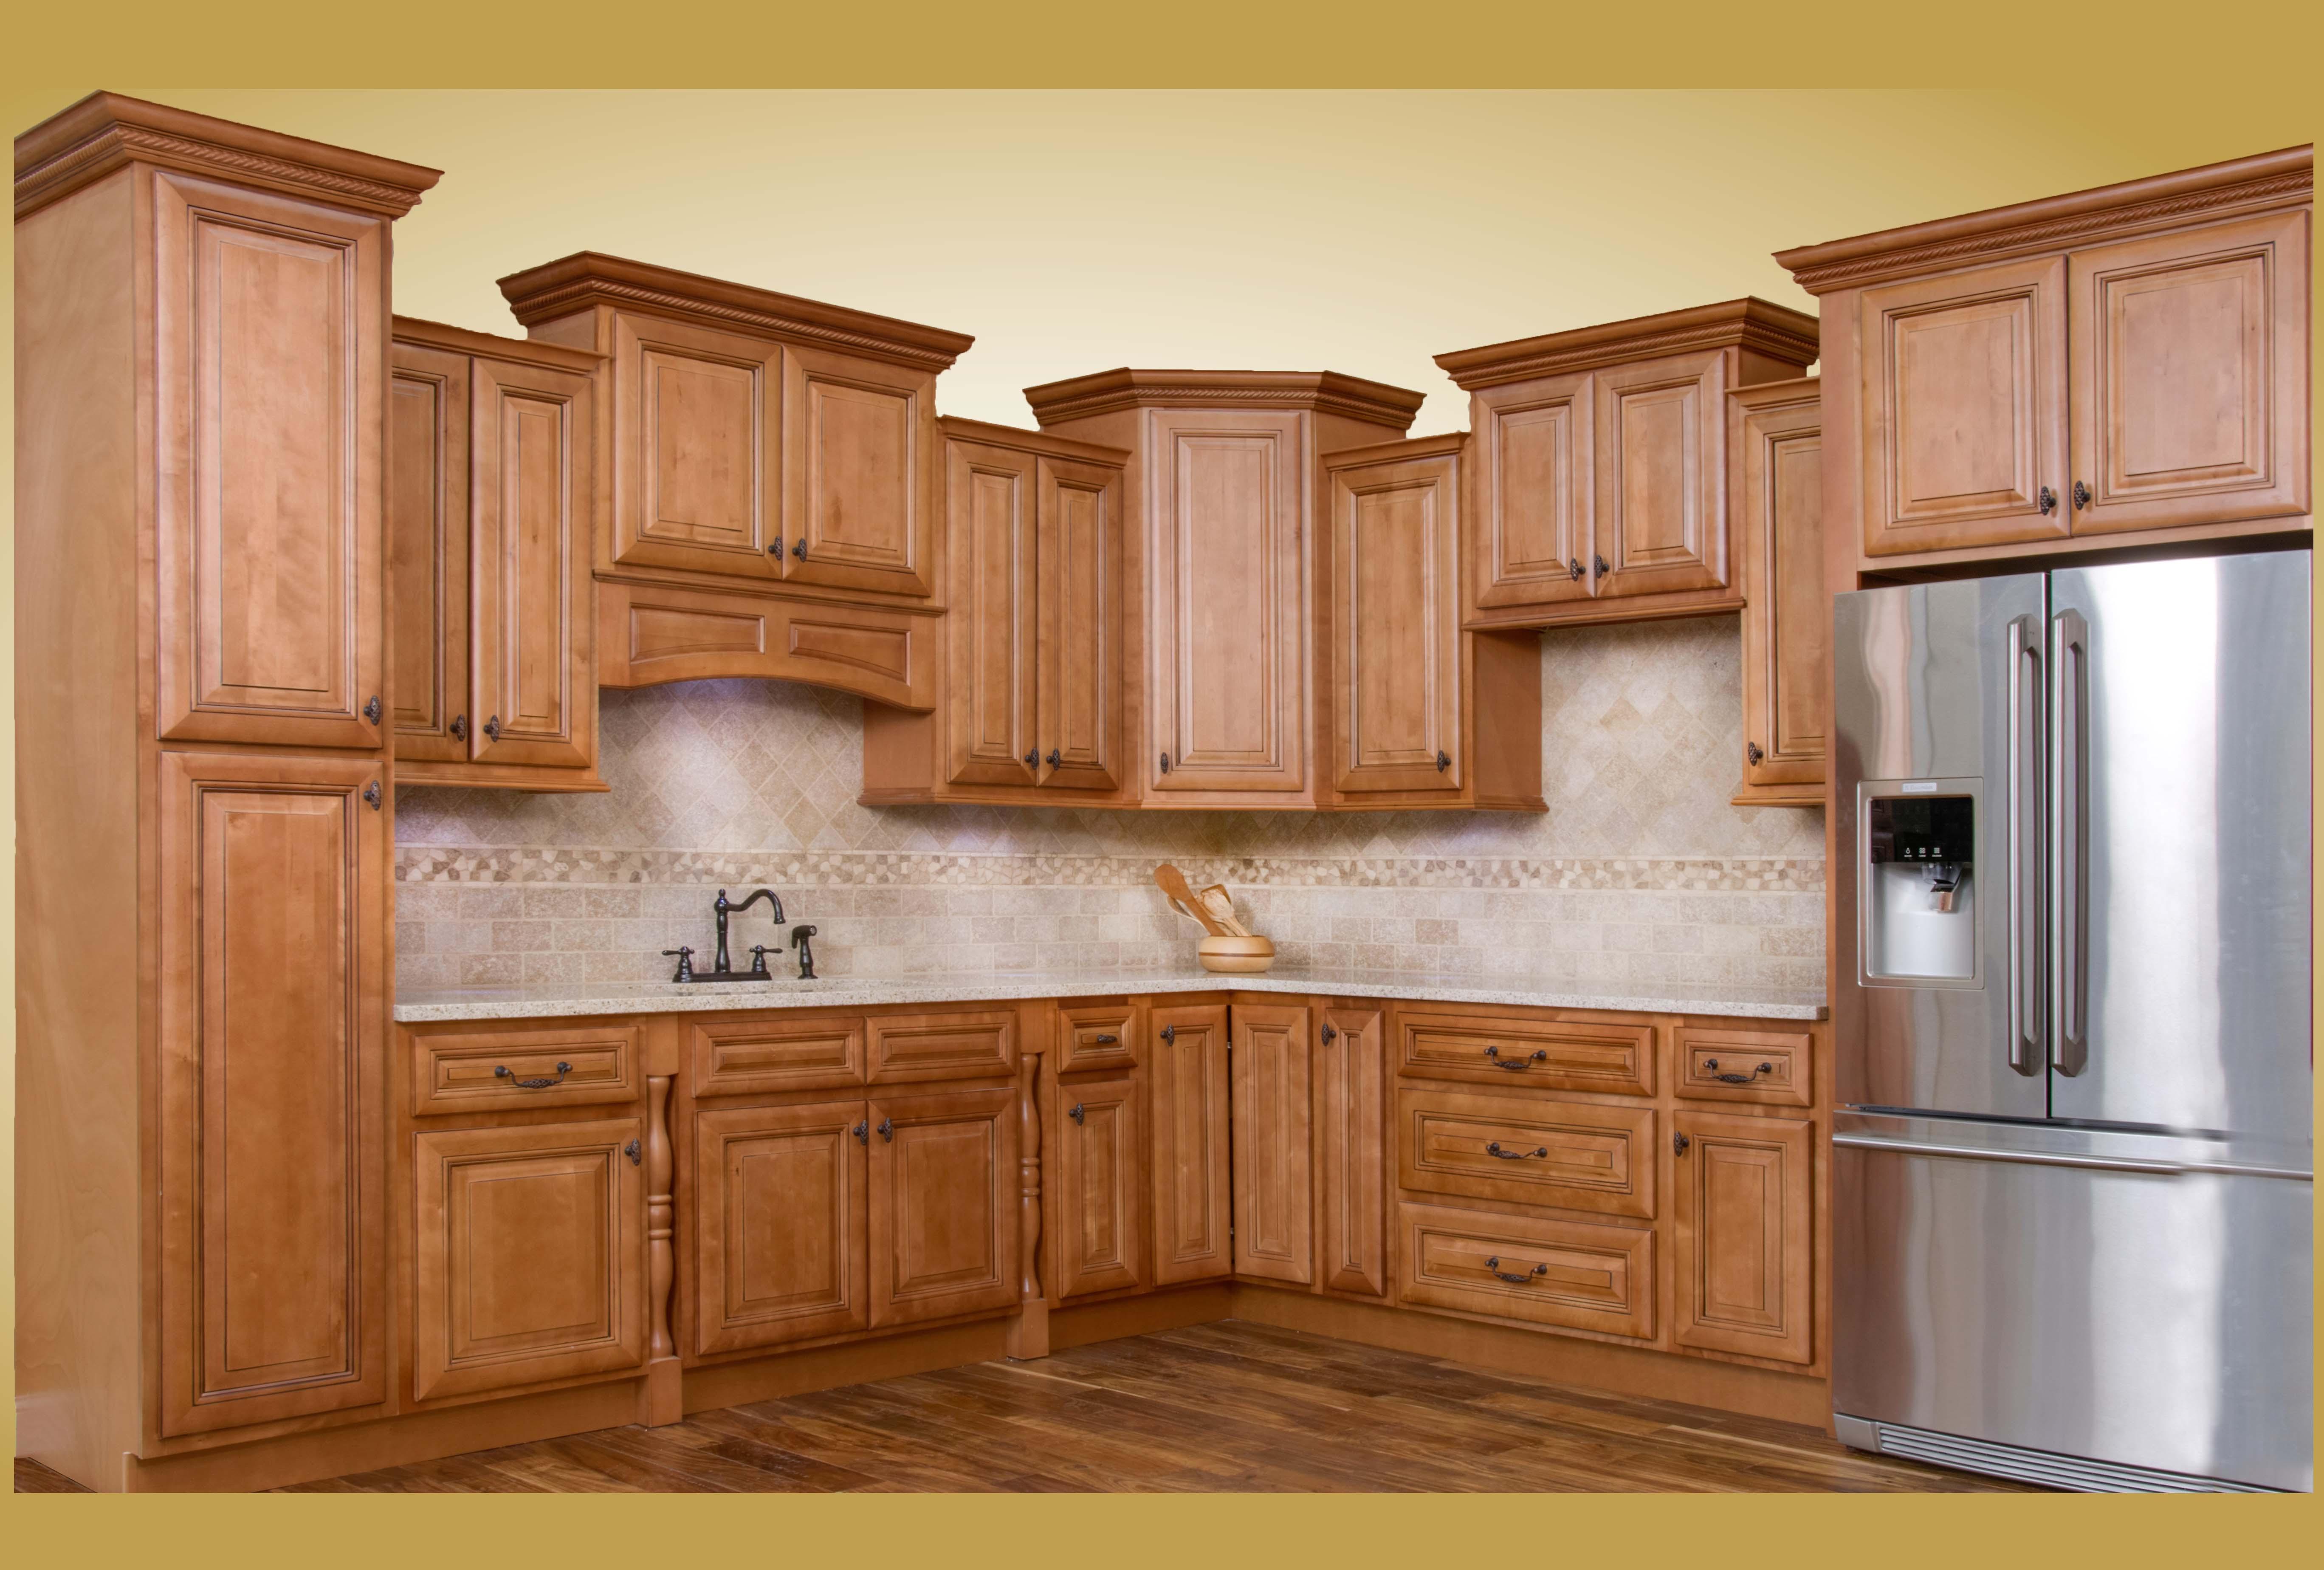 Singh kitchen cabinets brampton mf cabinets for Cheap kitchen cabinets brampton